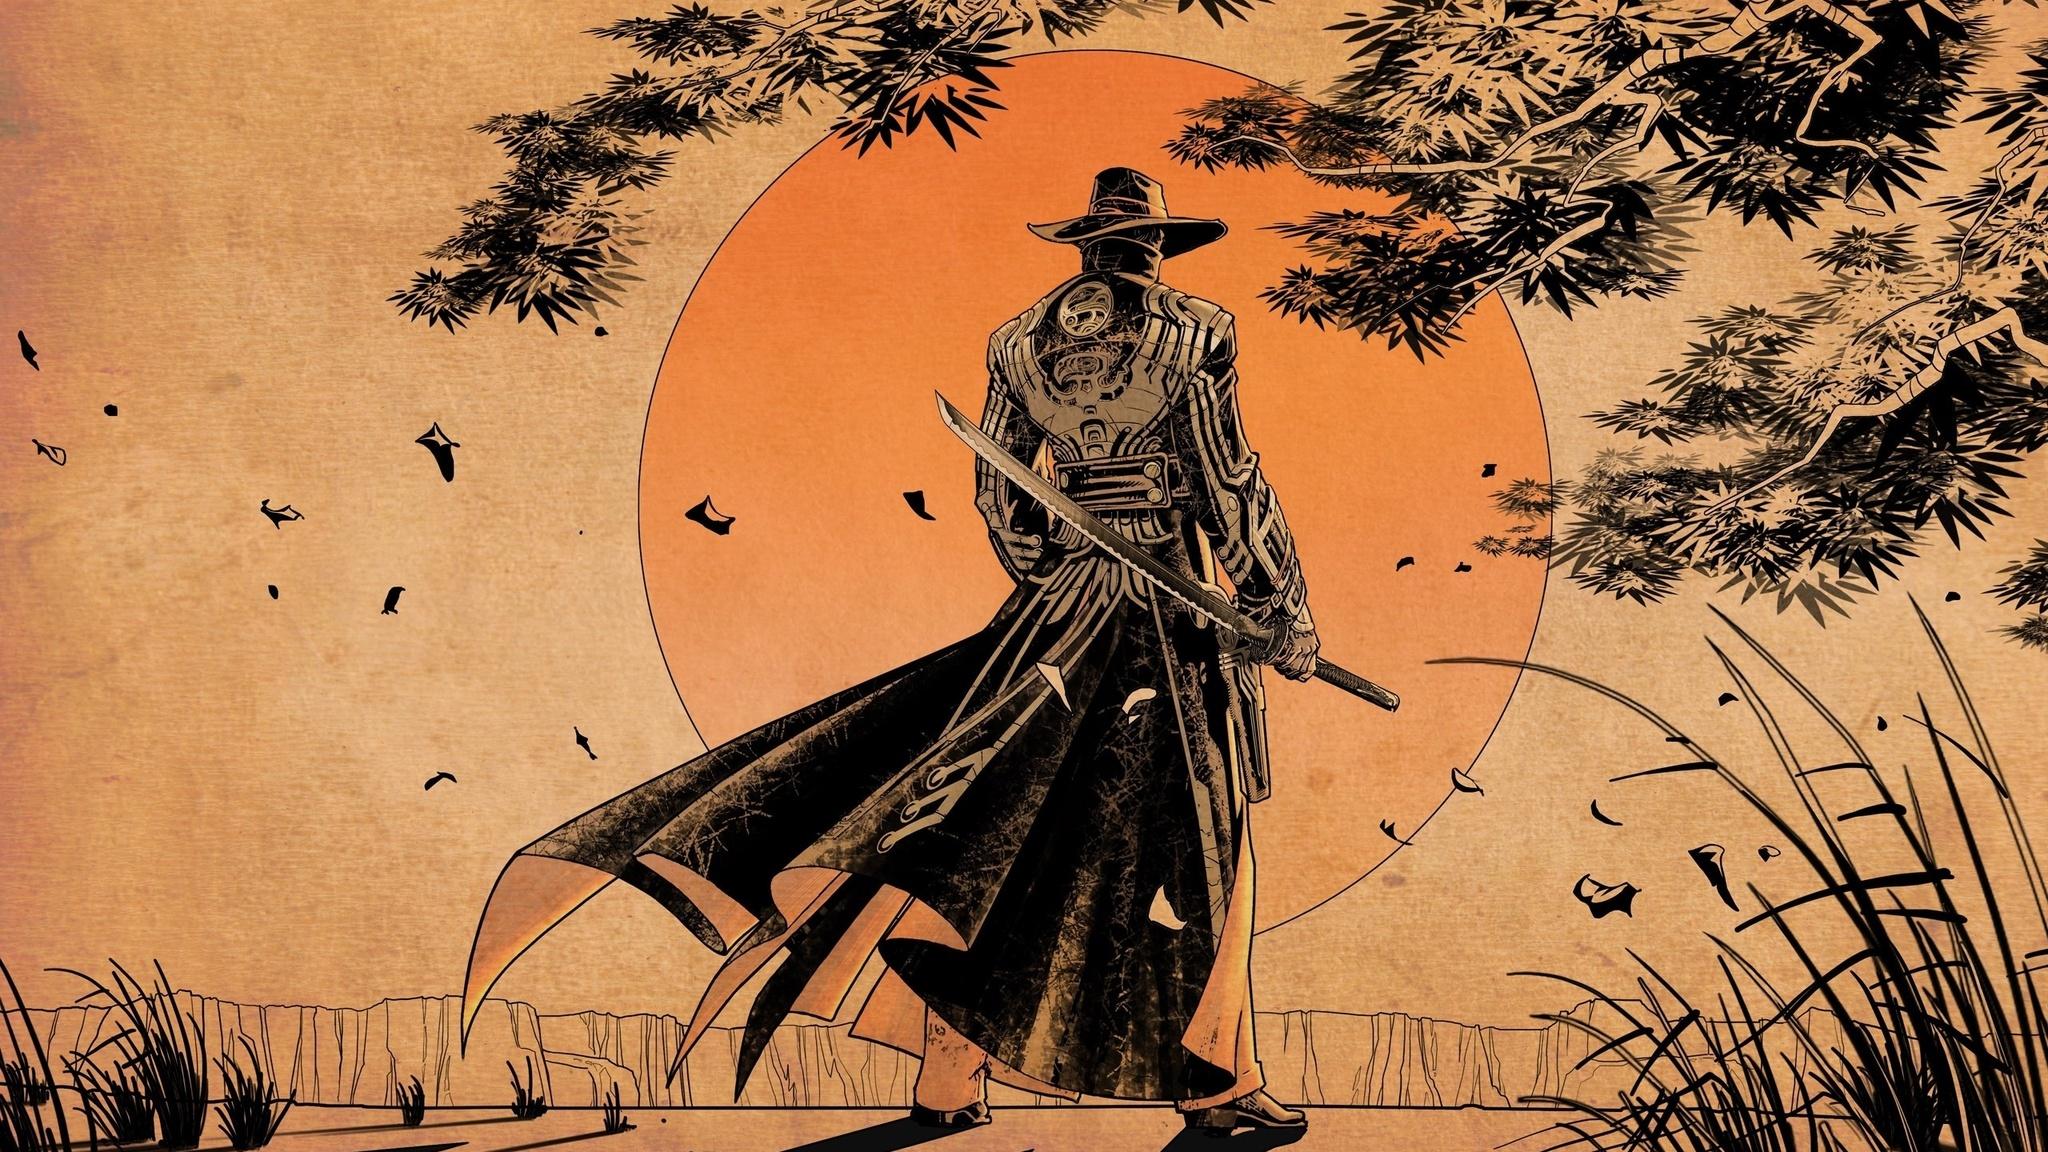 2048x1152 Samurai 2048x1152 Resolution HD 4k Wallpapers Images